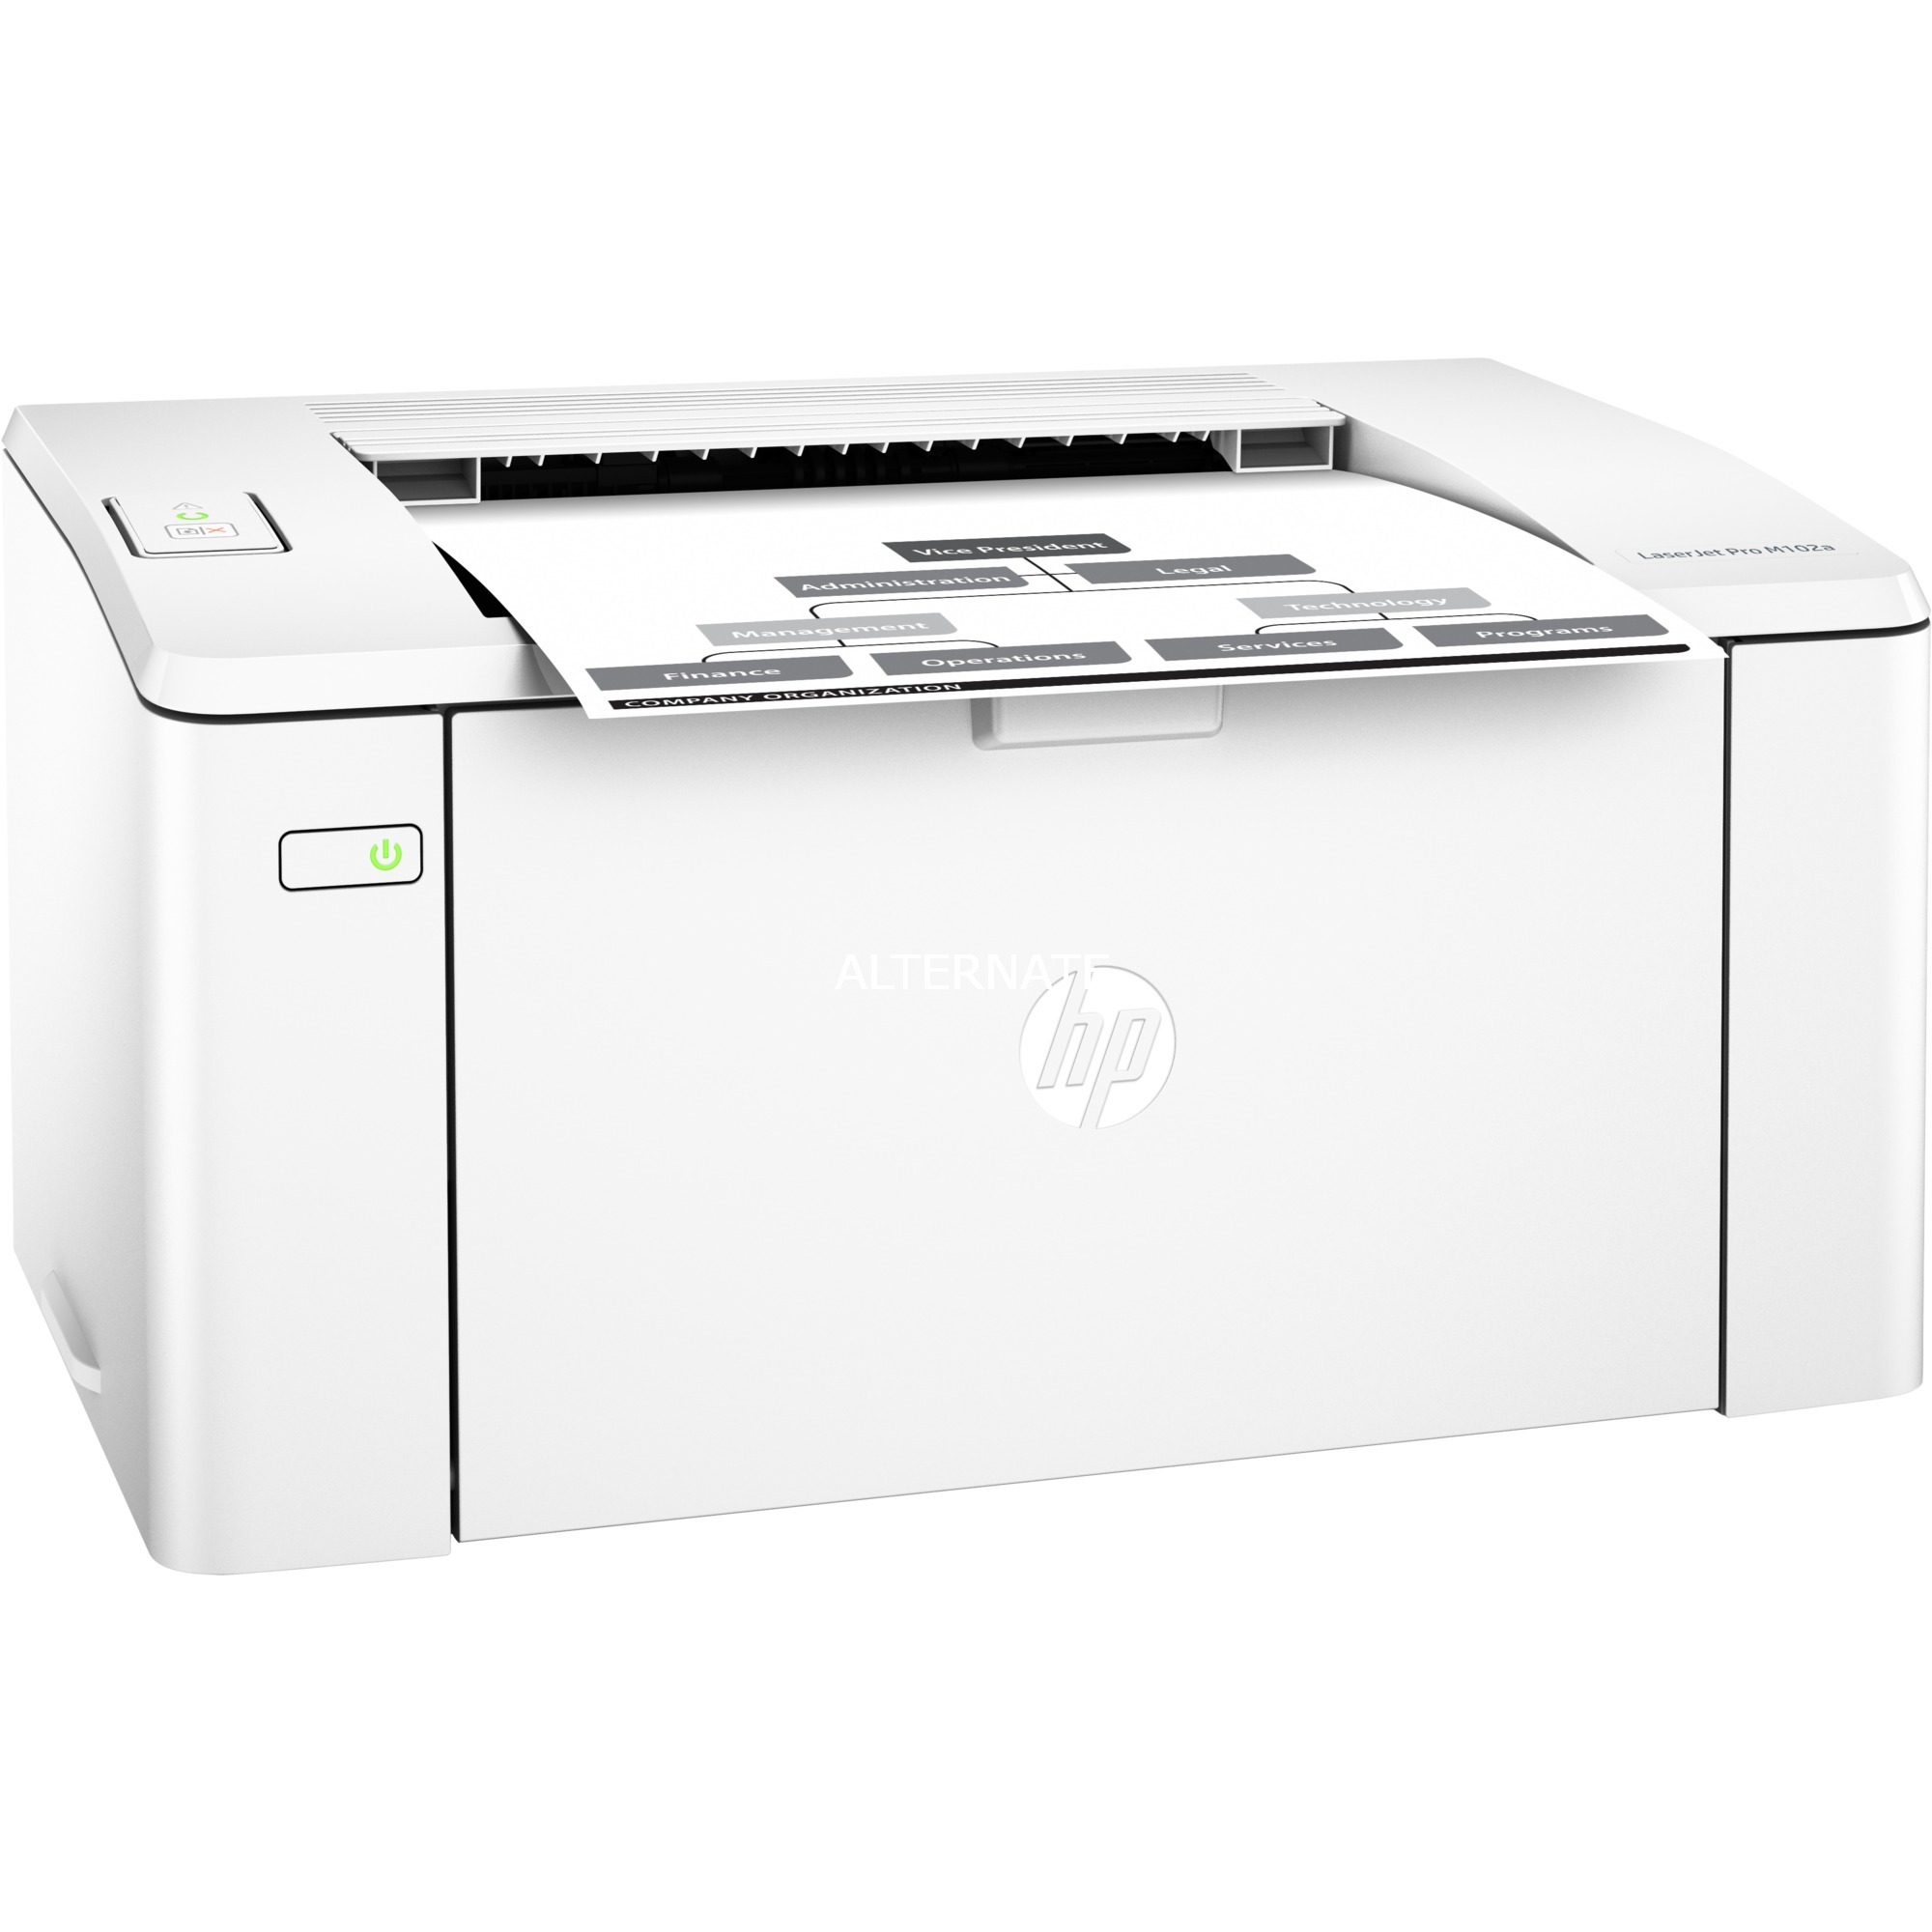 LaserJet Pro M102a 1200 x 1200 DPI A4, Impresora láser